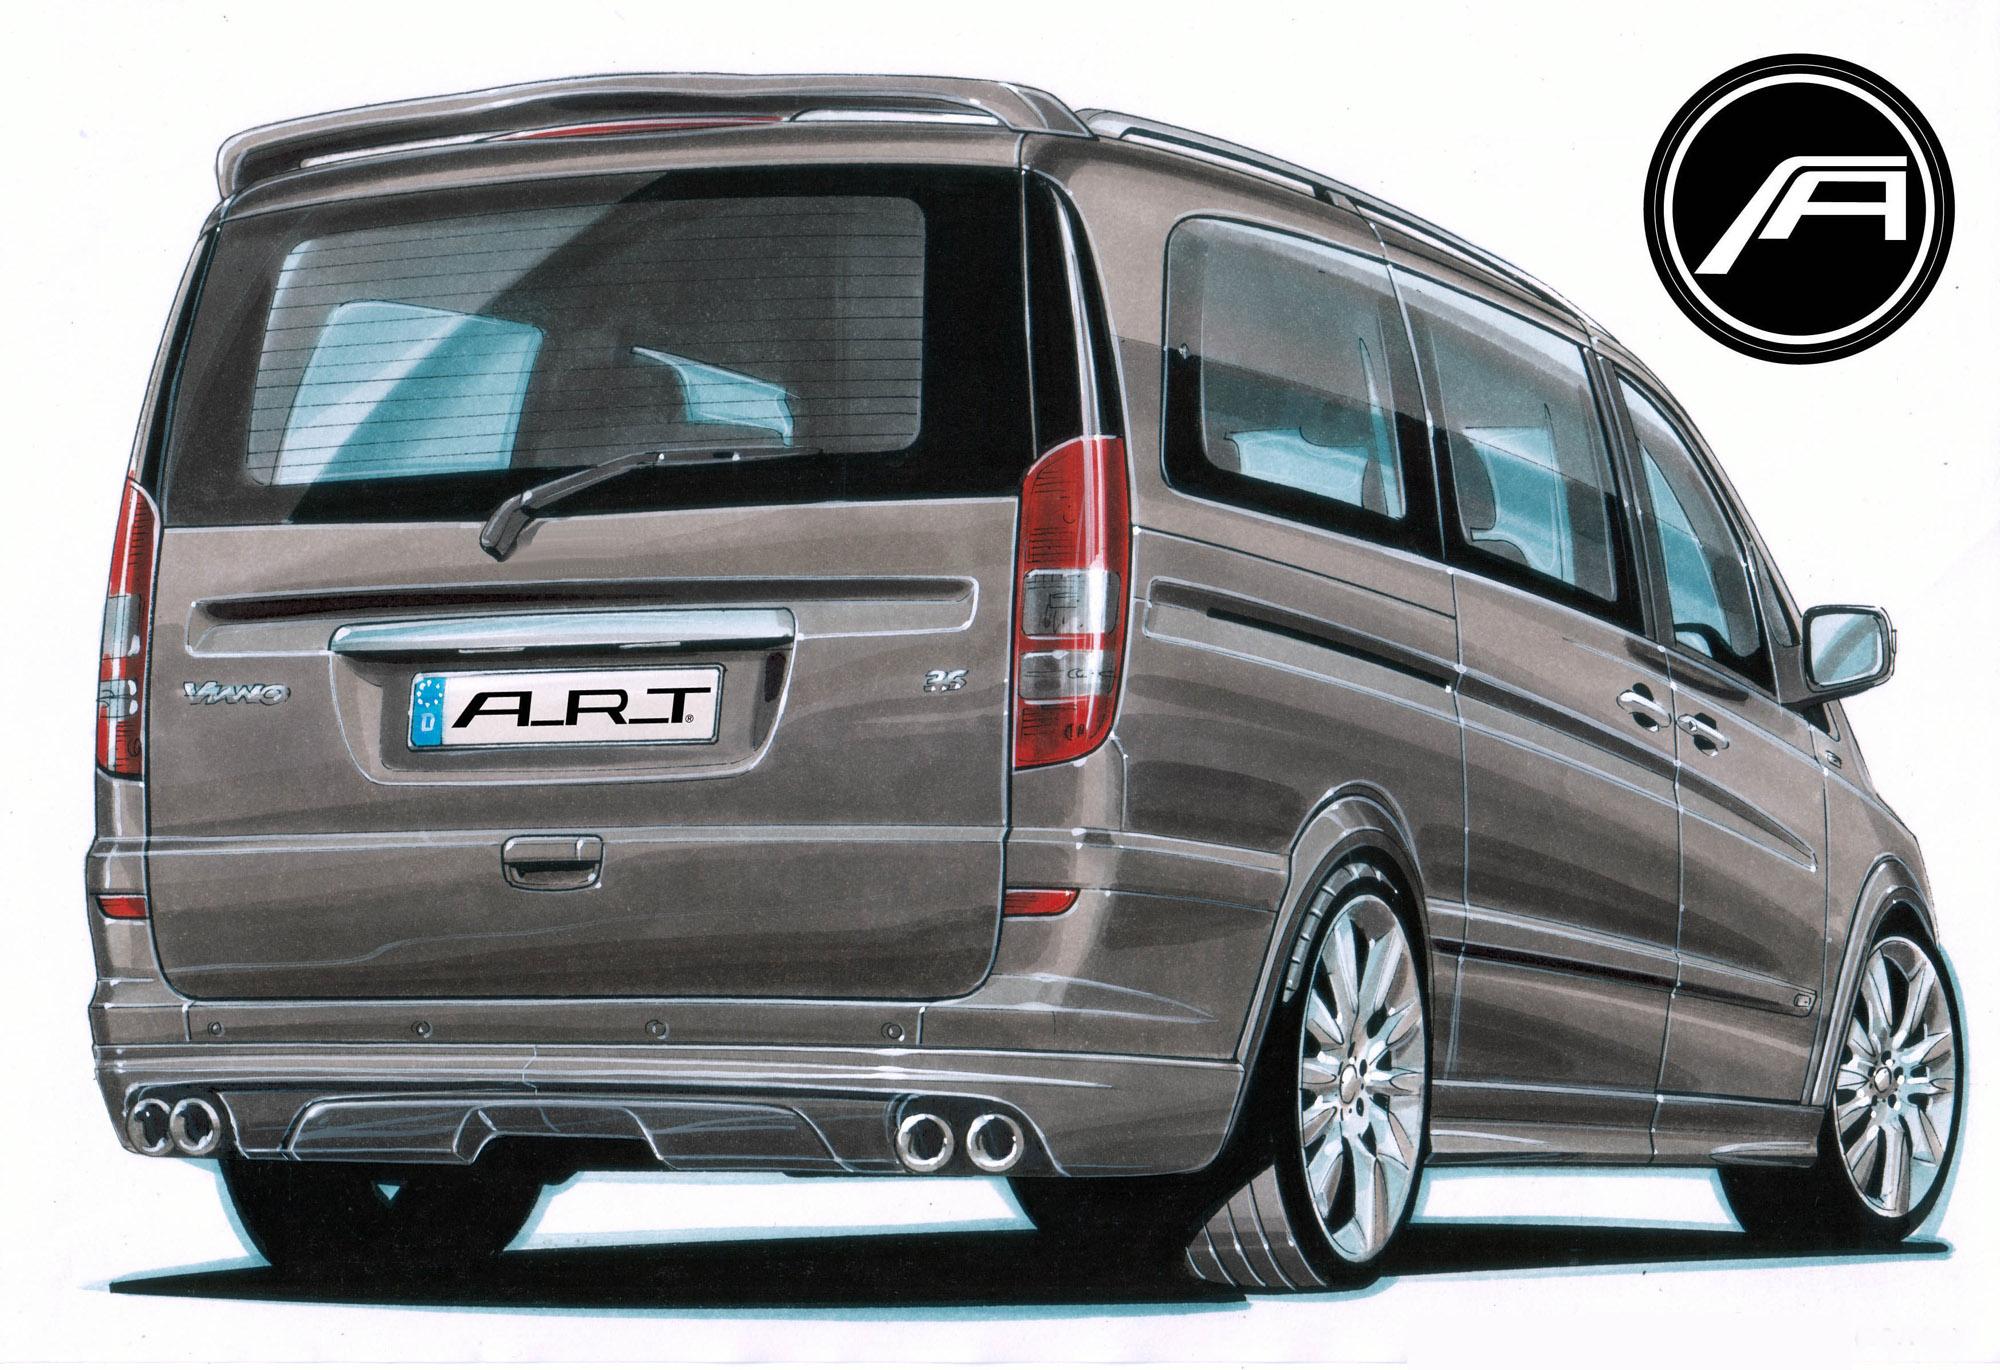 А. Р. Т тюнинг beutifies Mercedes-Benz Viano - фотография №2